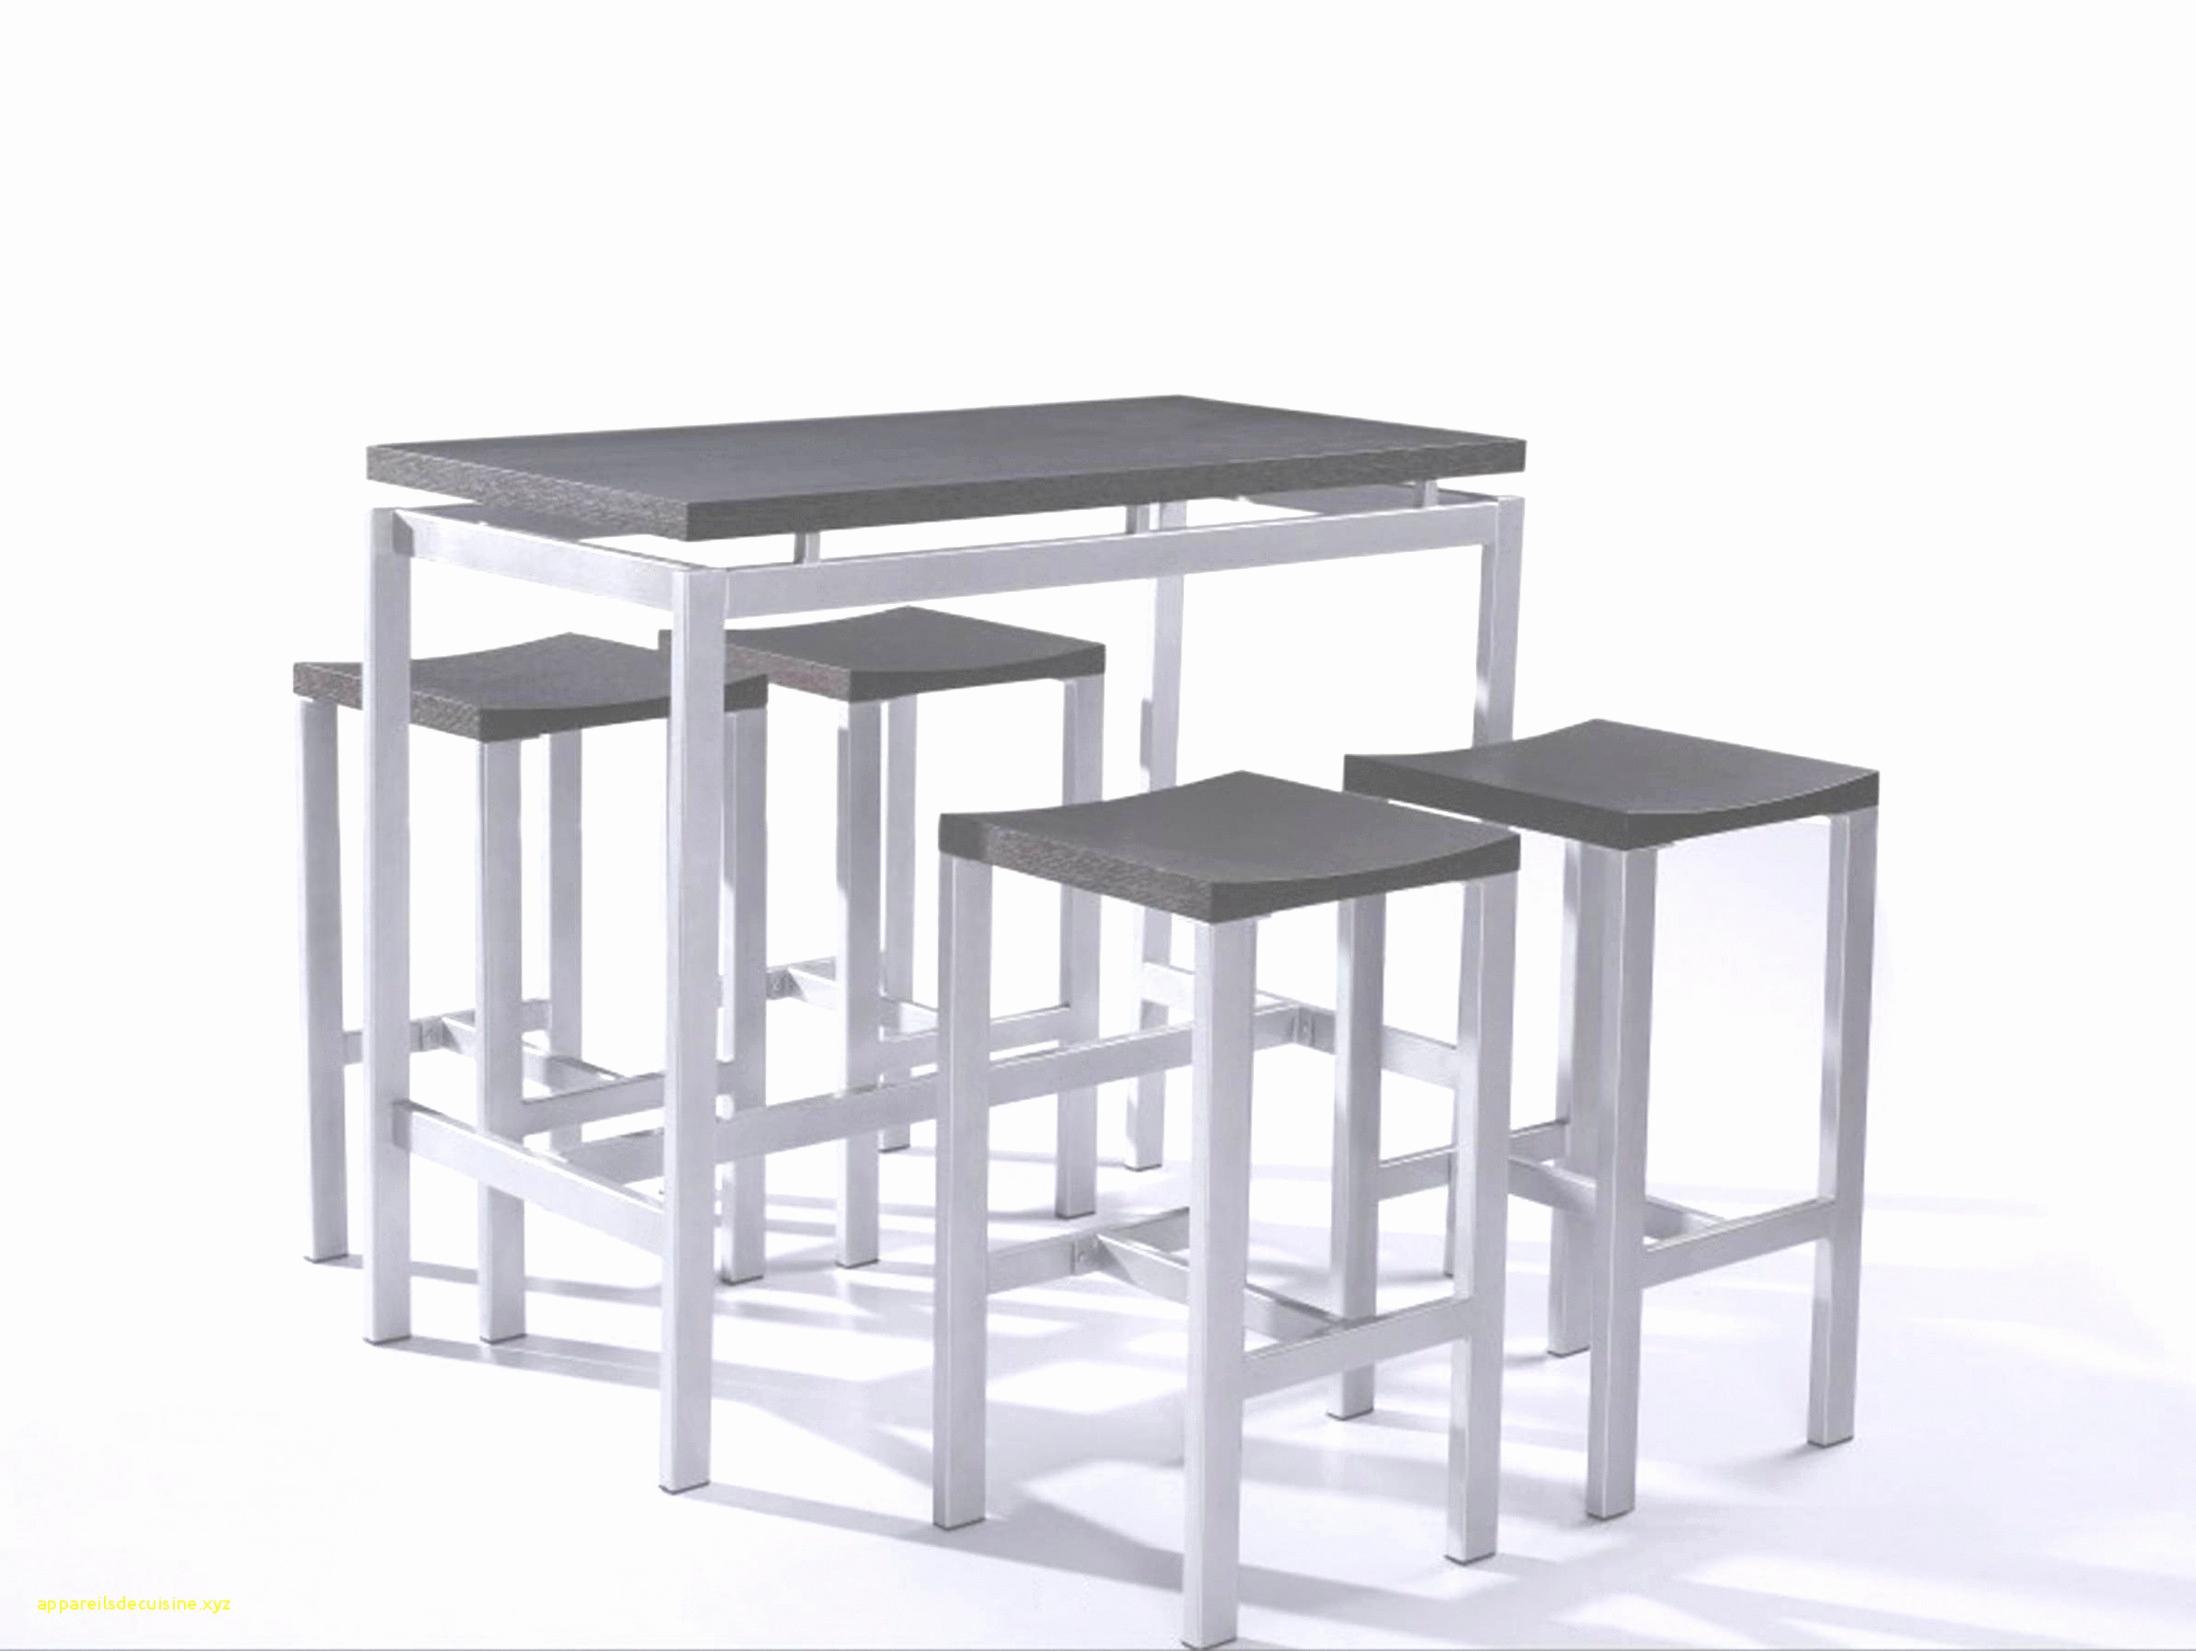 Table Industrielle Ikea Beau Table Bureau Ikea Luxe Table De ... dedans Table Basse De Jardin Ikea